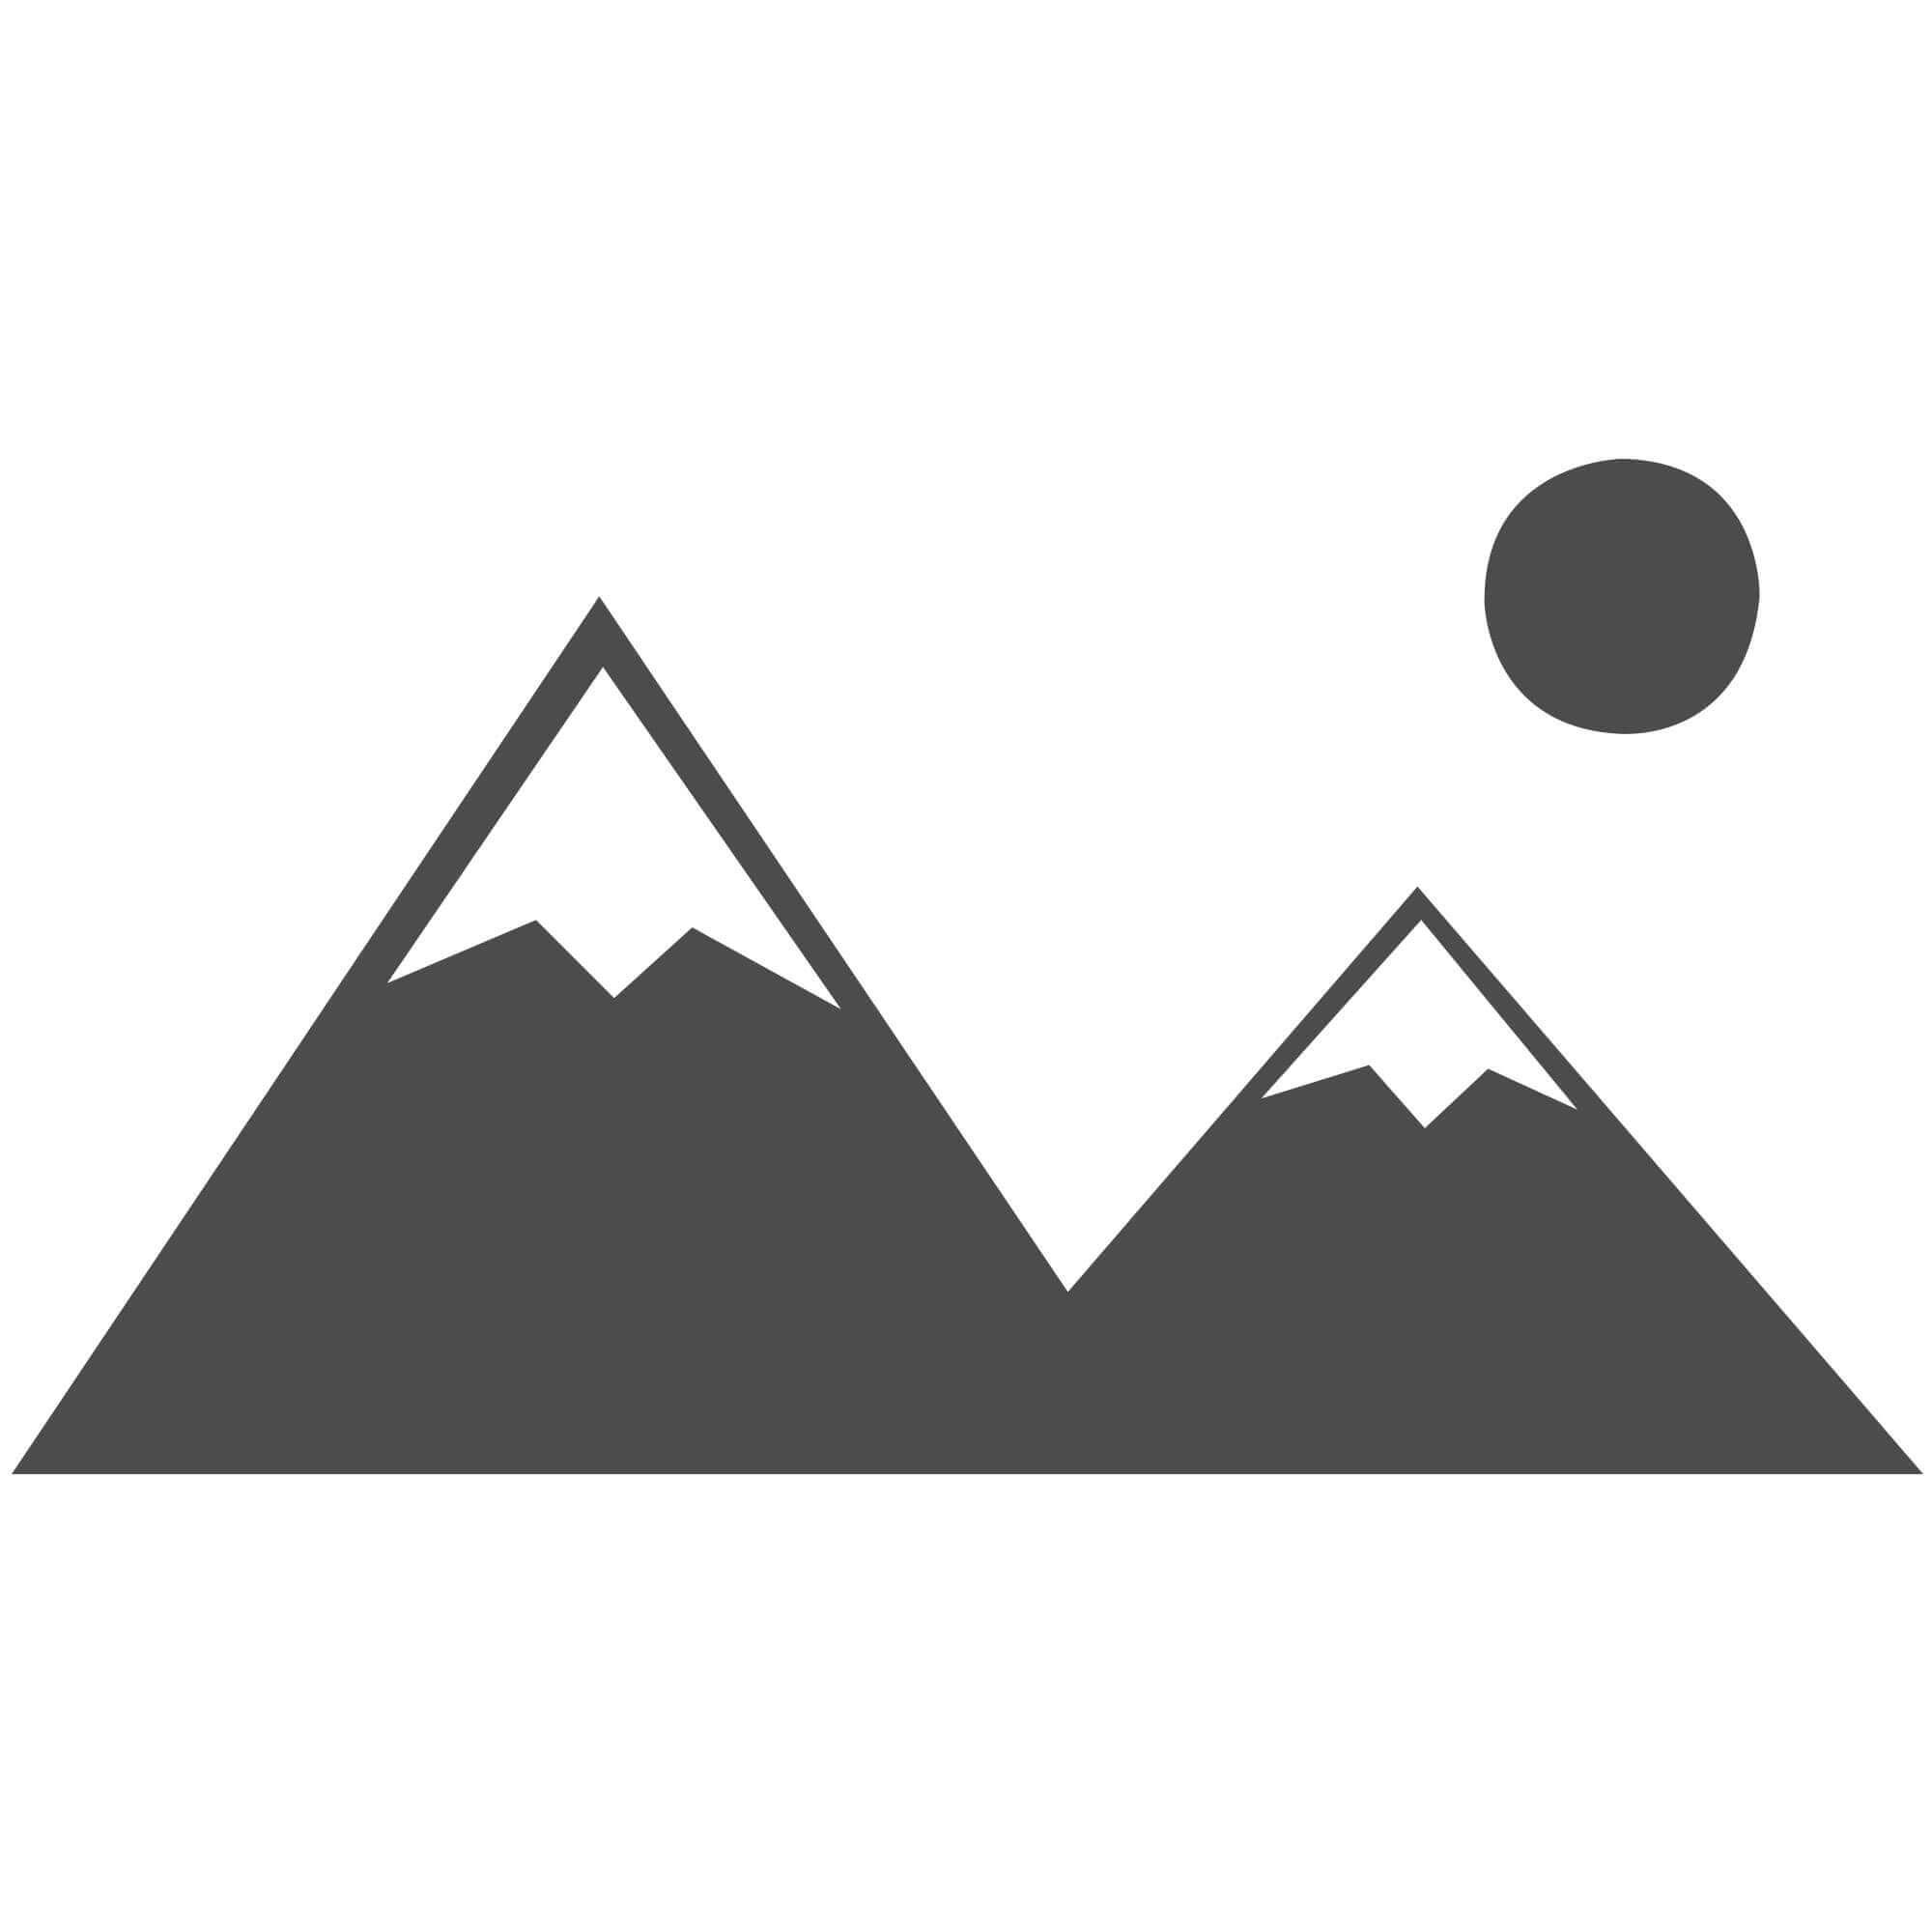 Arabesque Moroccan Pattern Wool Rug - Grey